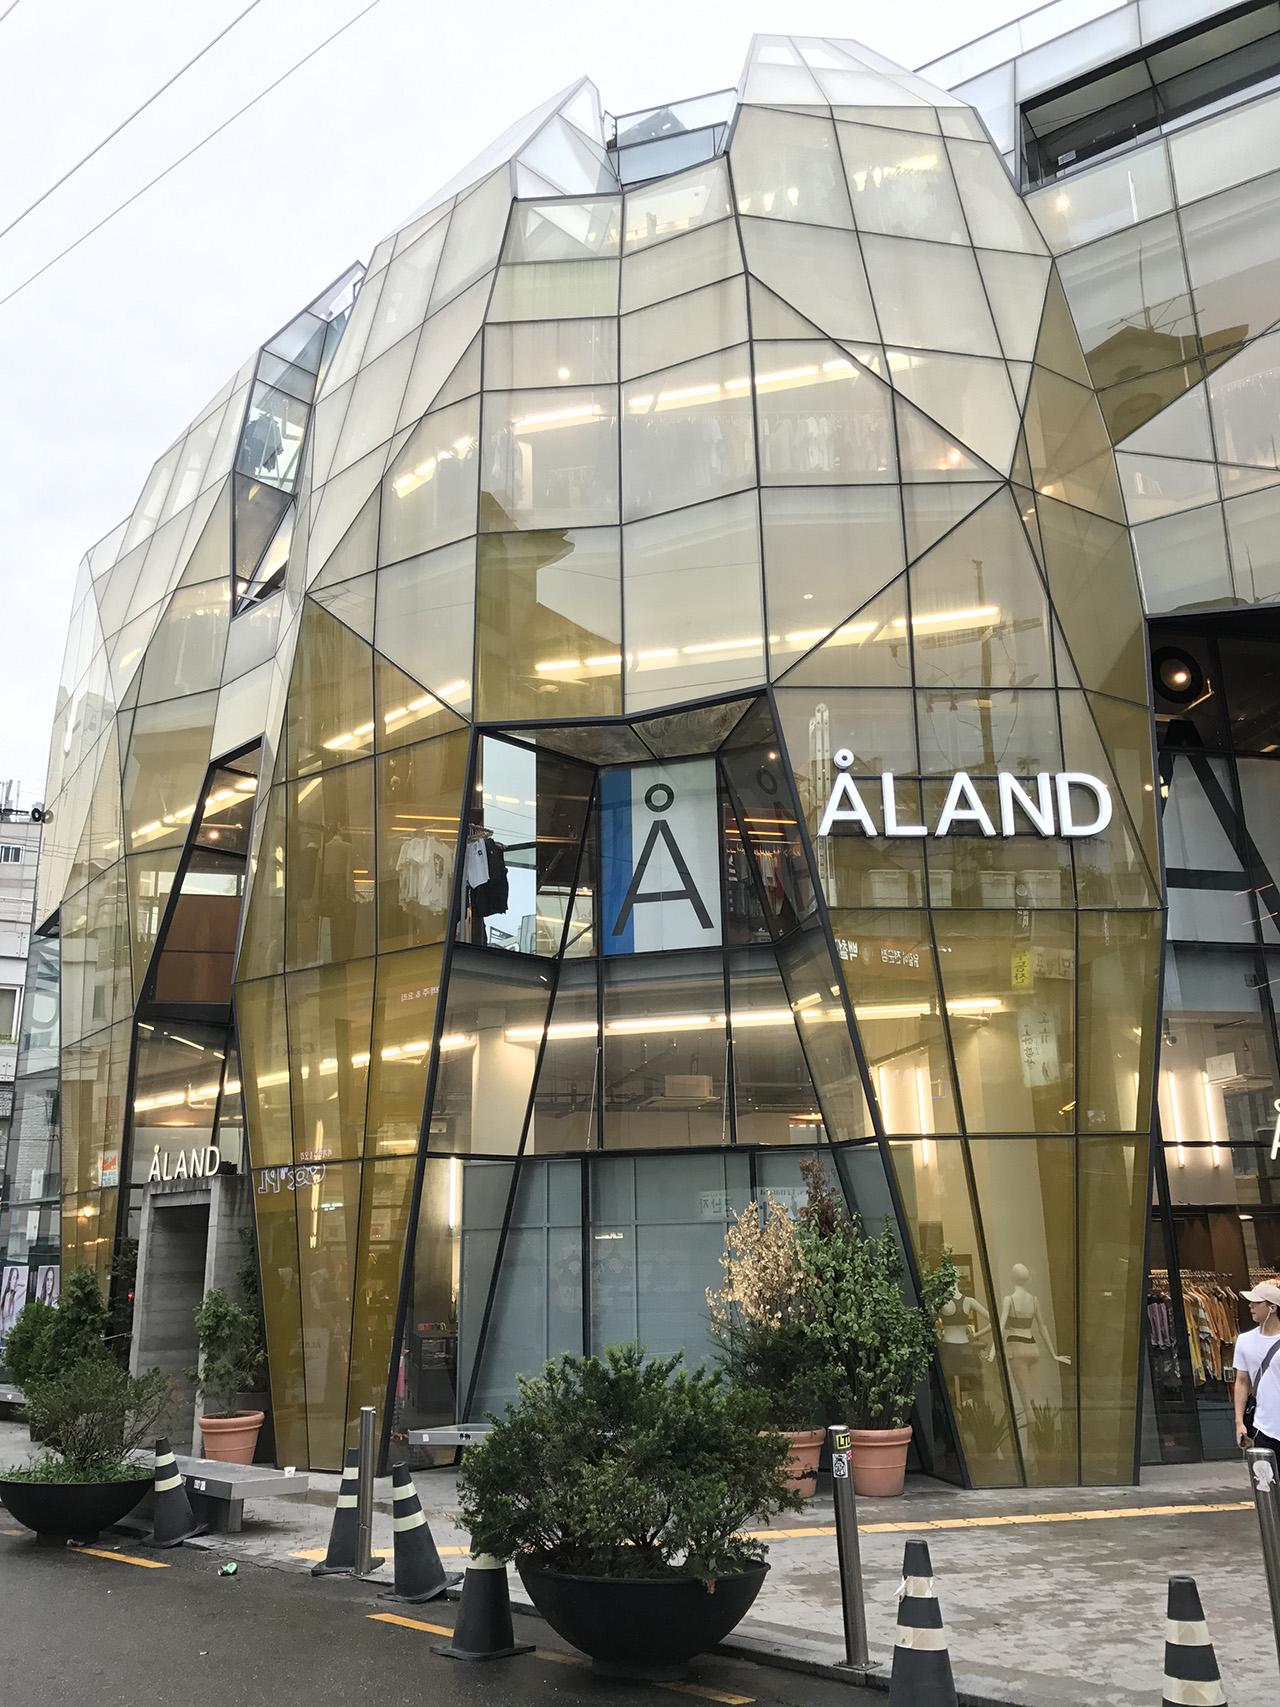 Pendulum Magazine - One Day In Seoul A LAND Shopping